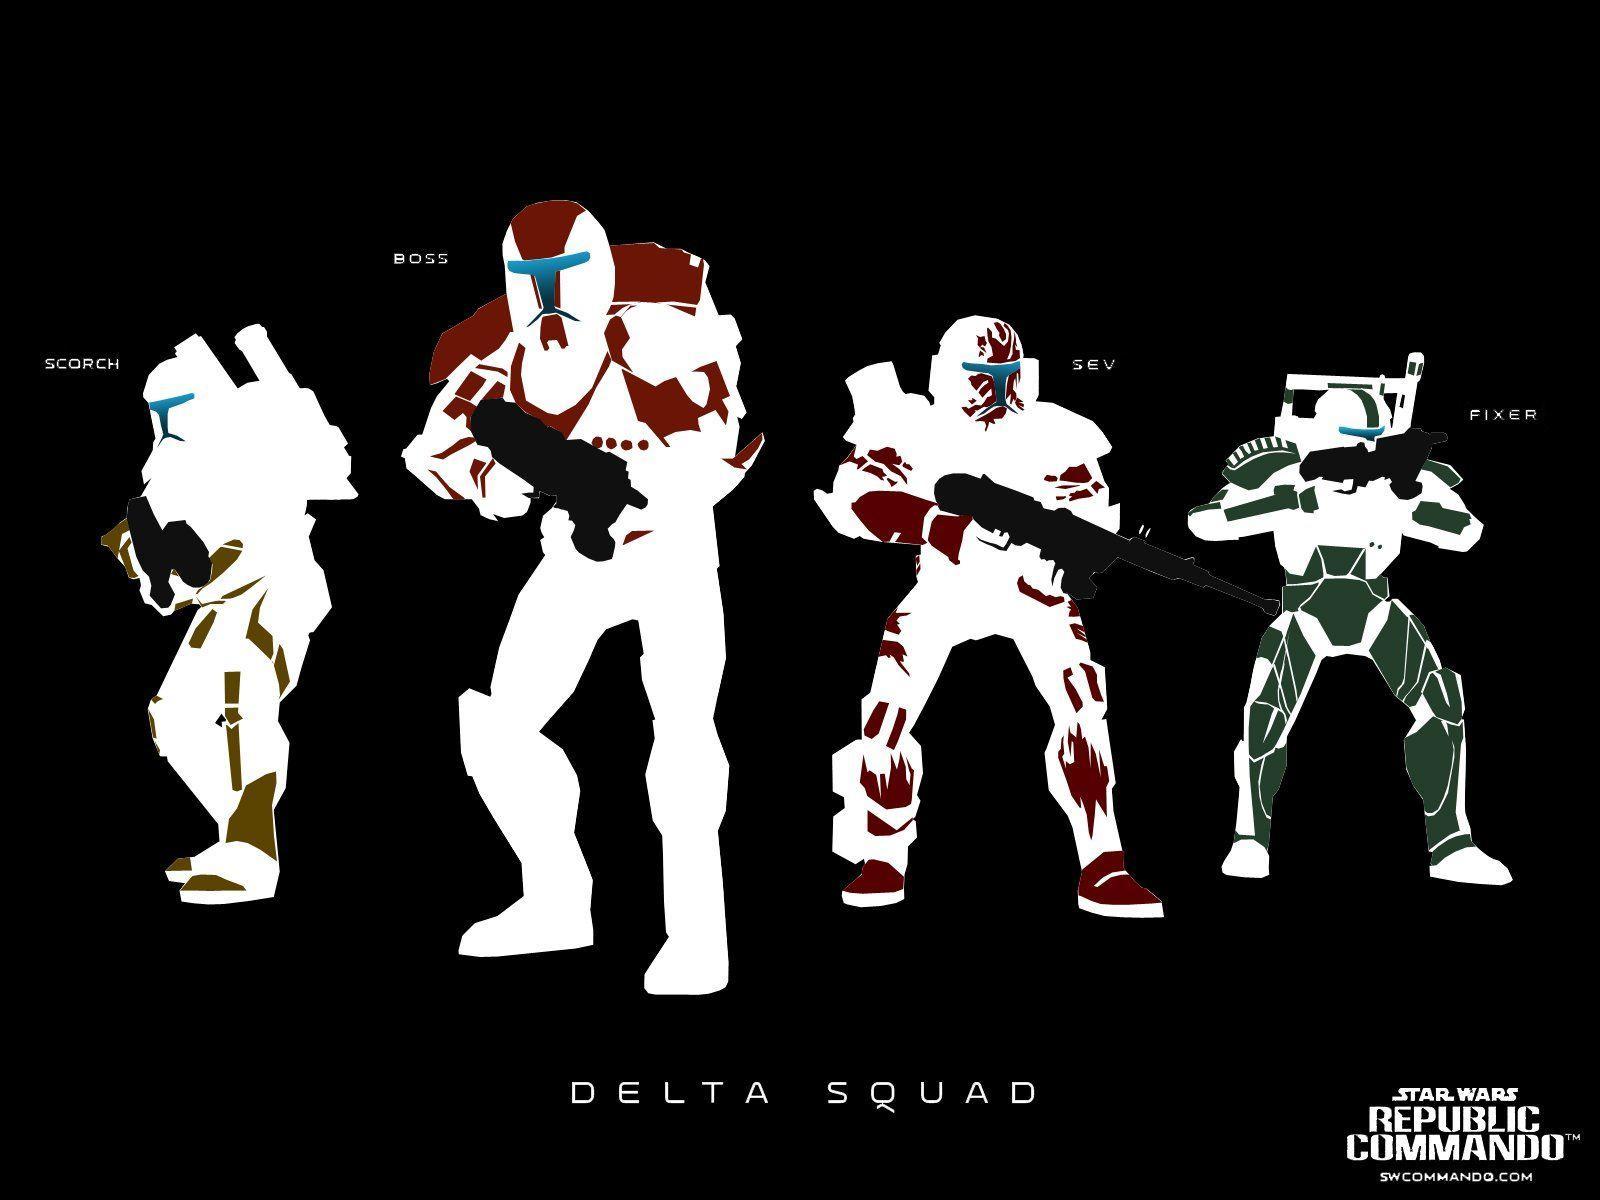 Republic Commando Wallpapers Top Free Republic Commando